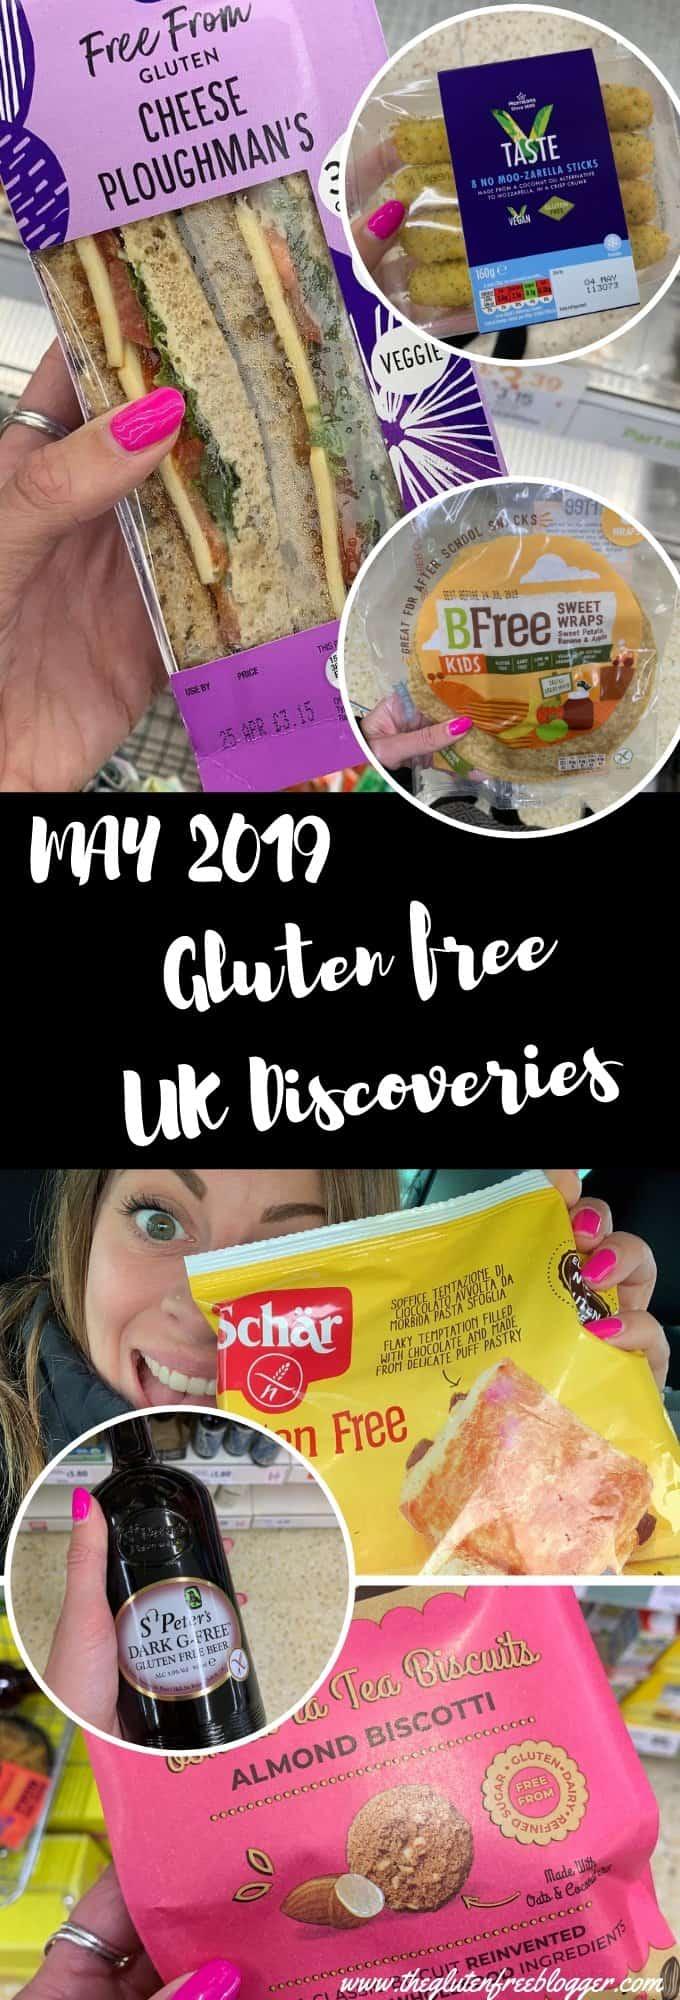 gluten free discoveries uk 2019 coeliac celiac